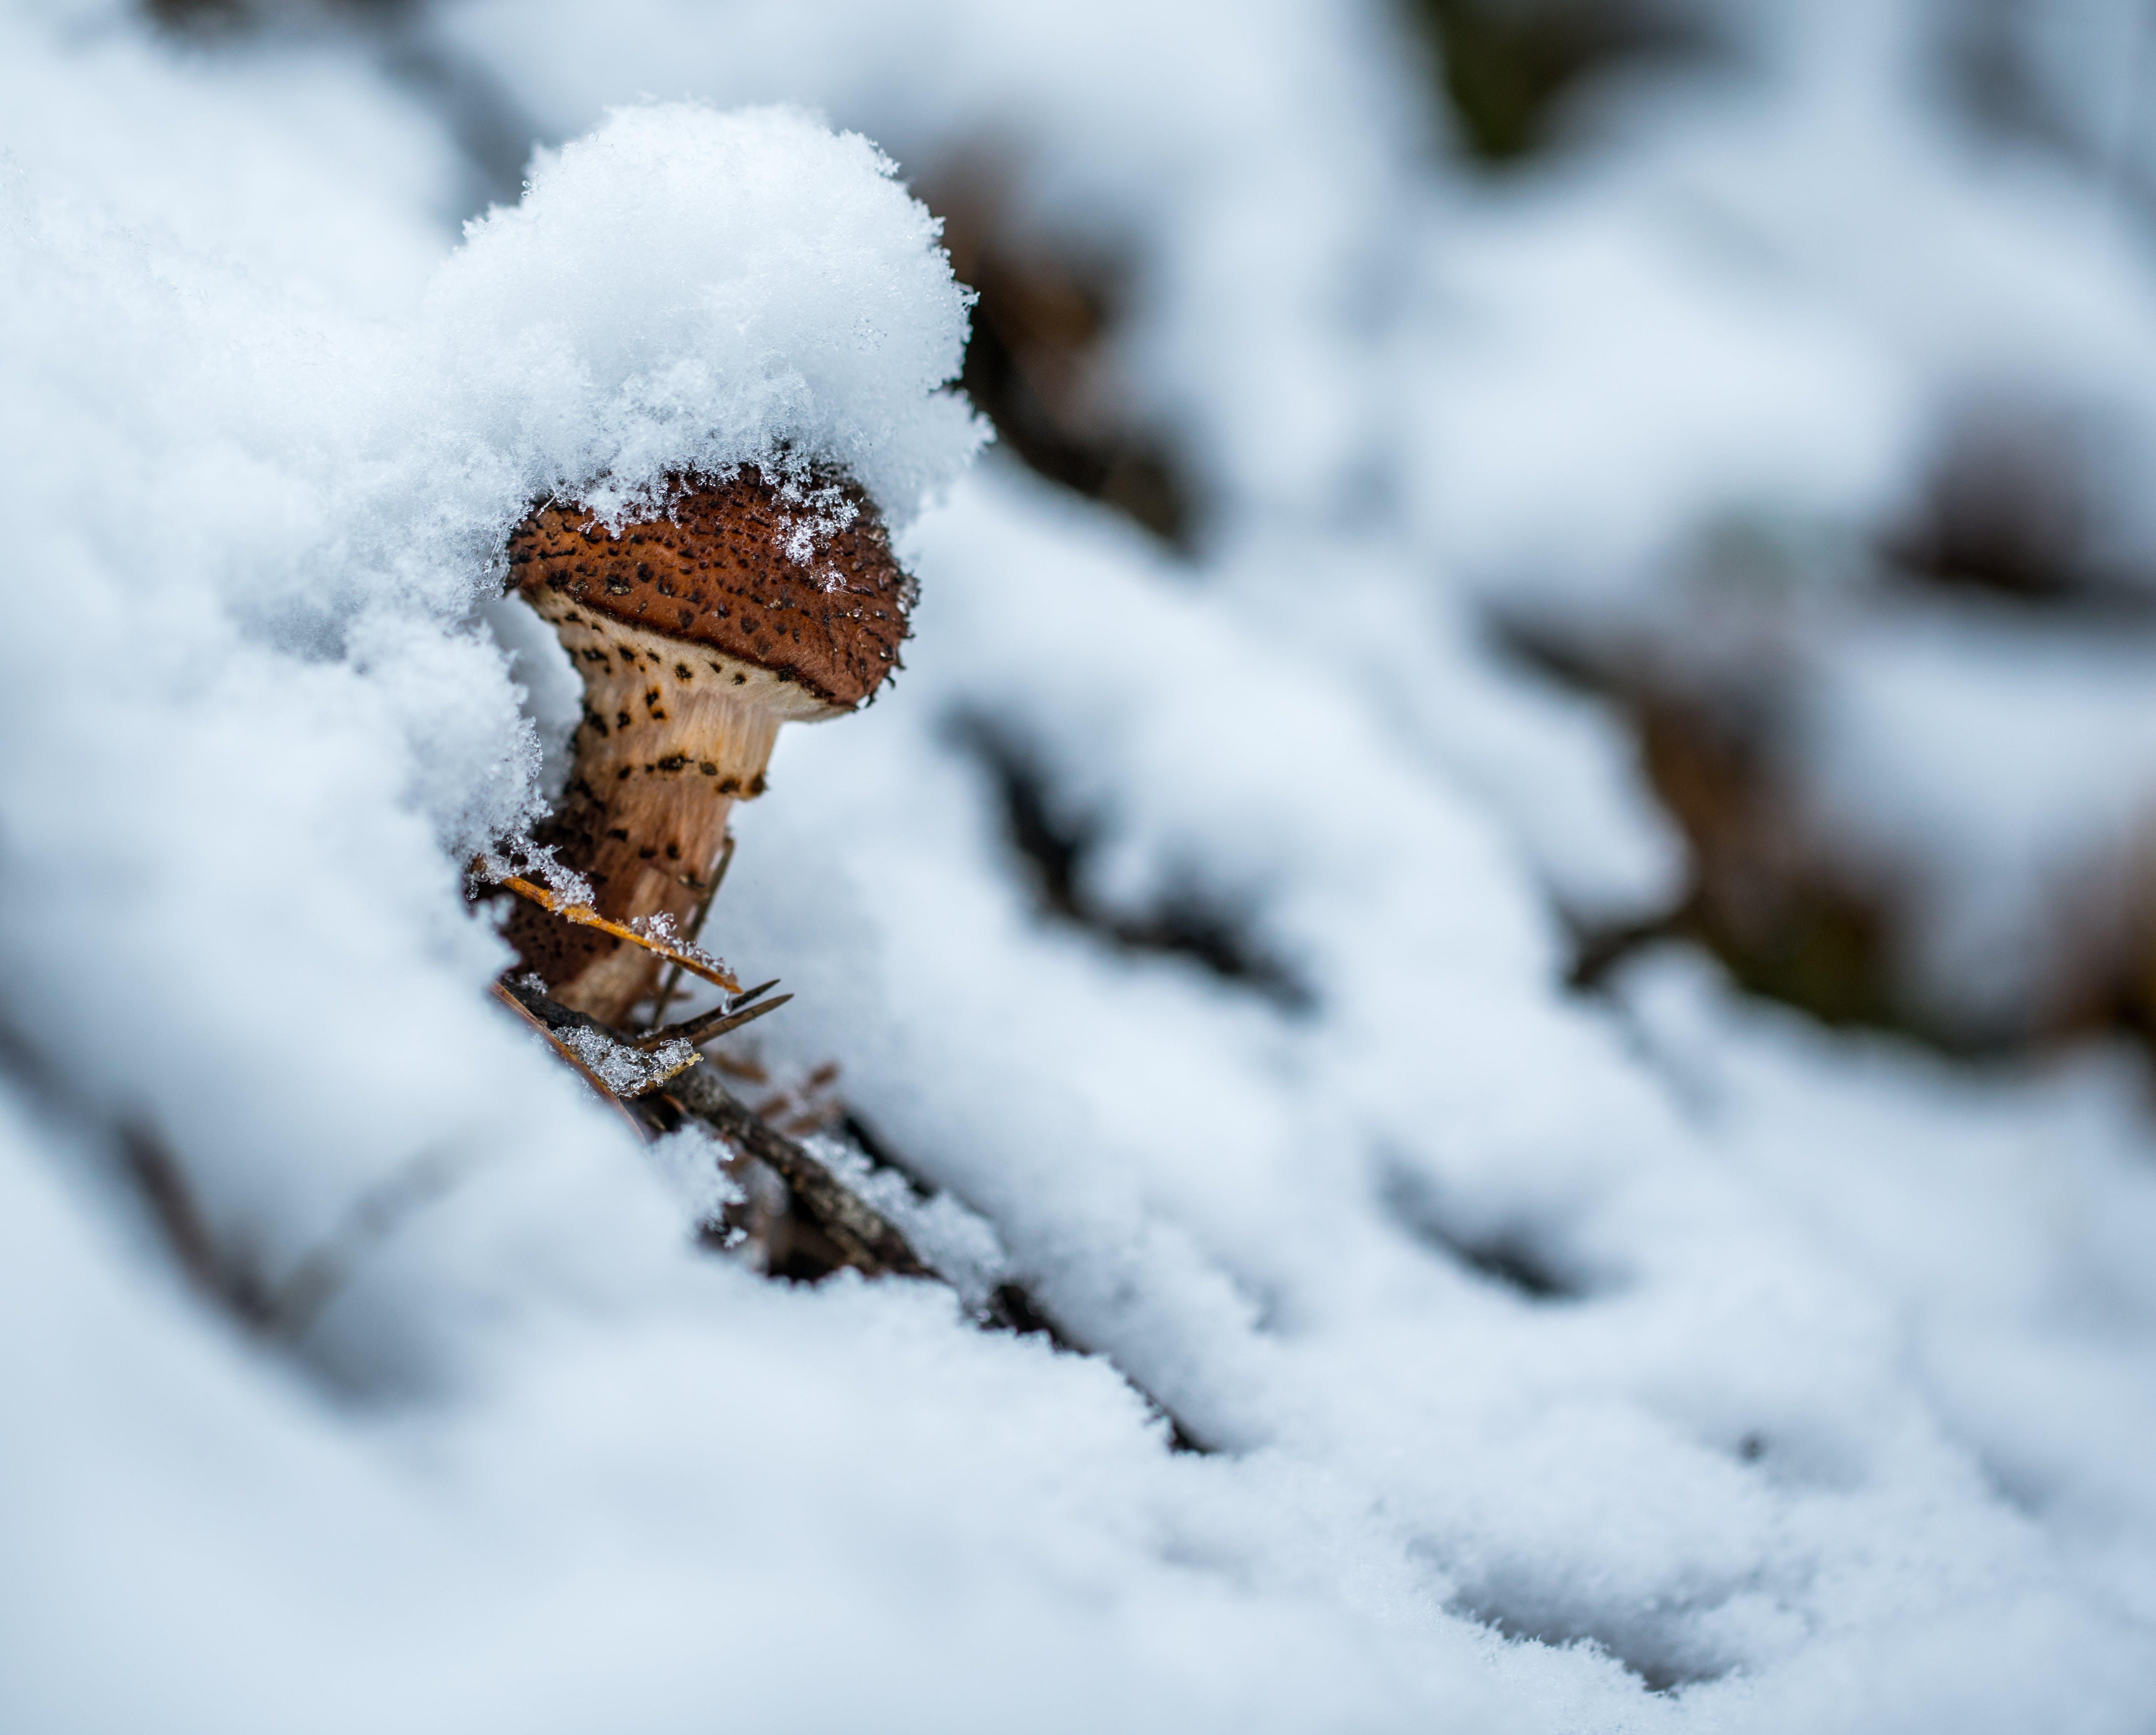 Mushroom Covered by Snoe